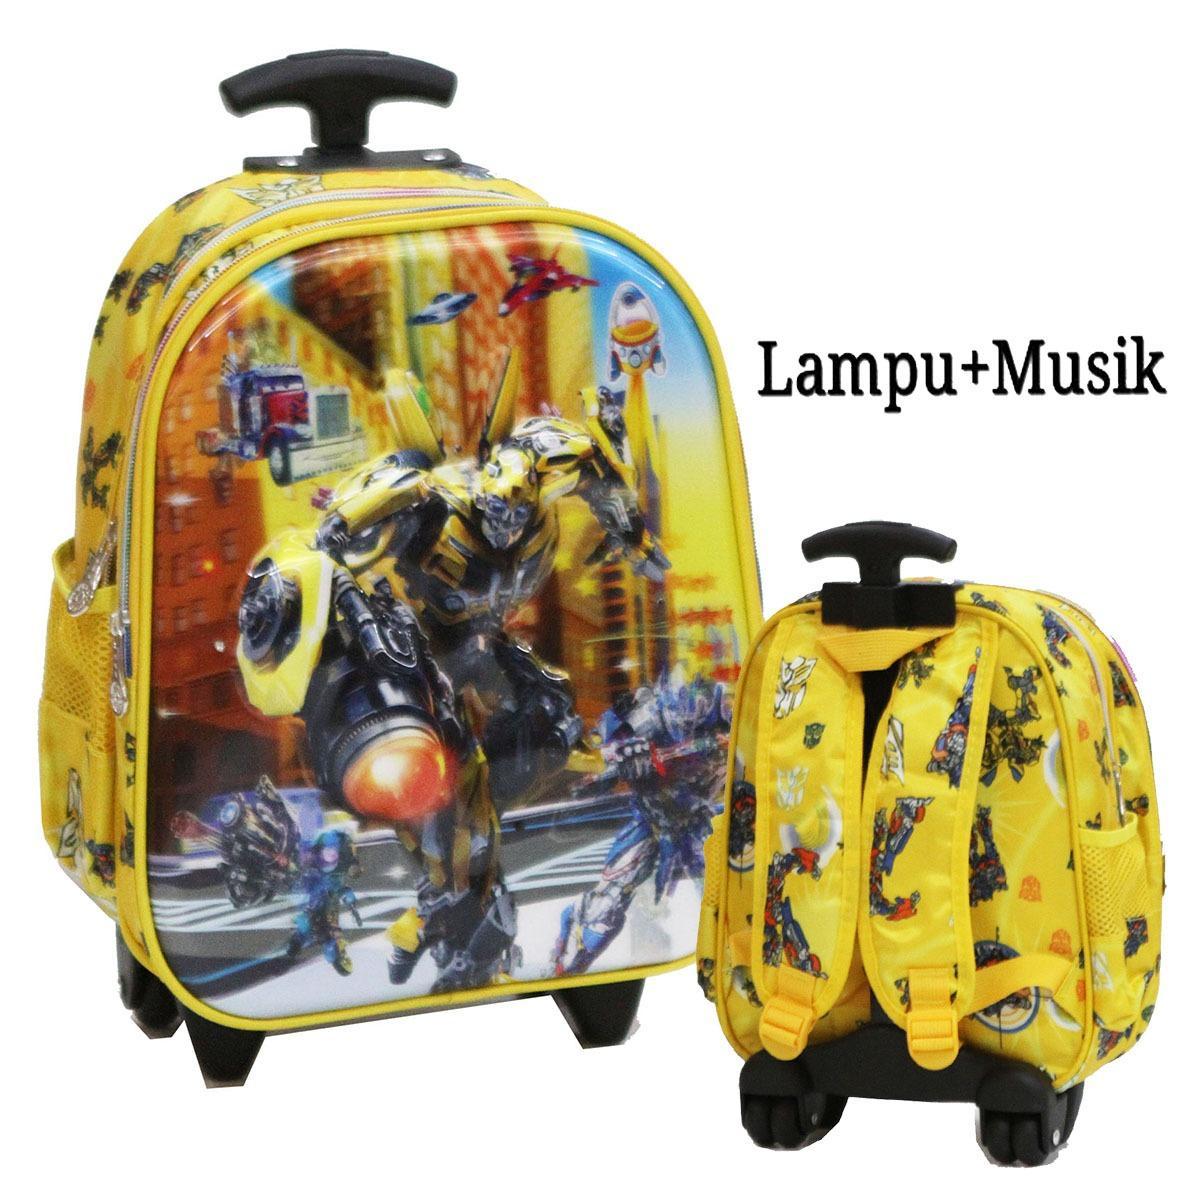 Diskon Besaronlan Tas Trolley Anak Sekolah Tk Transformers Lampu Music 5D Timbul Import